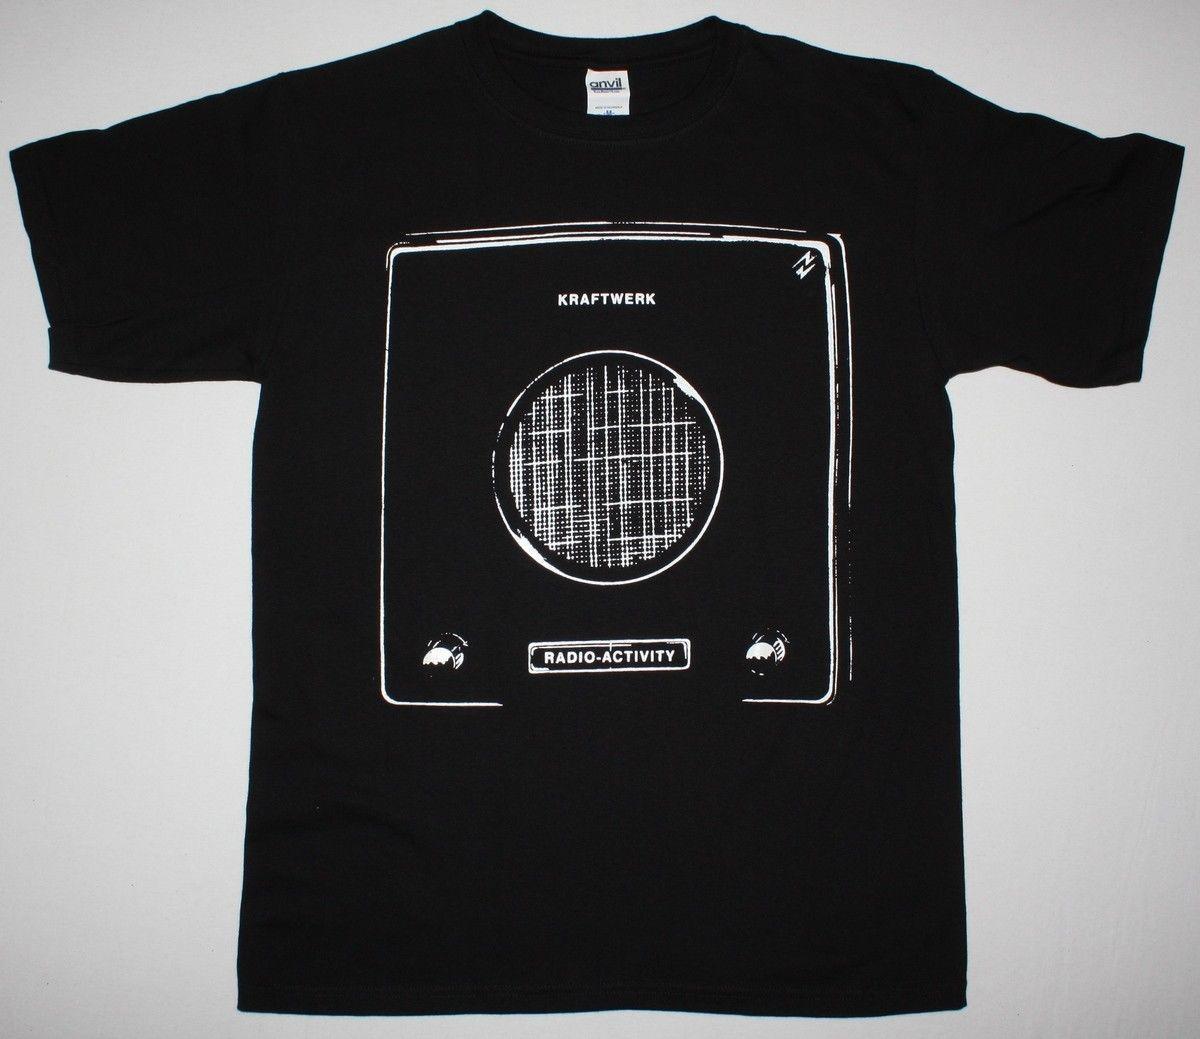 KRAFTWERK RADIO ACTIVITY BLACK T SHIRT ELECTRONIC SYNTH POP NEU! ULTRAVOX Short Sleeve Round Neck T-Shirt Promotion Top Tee